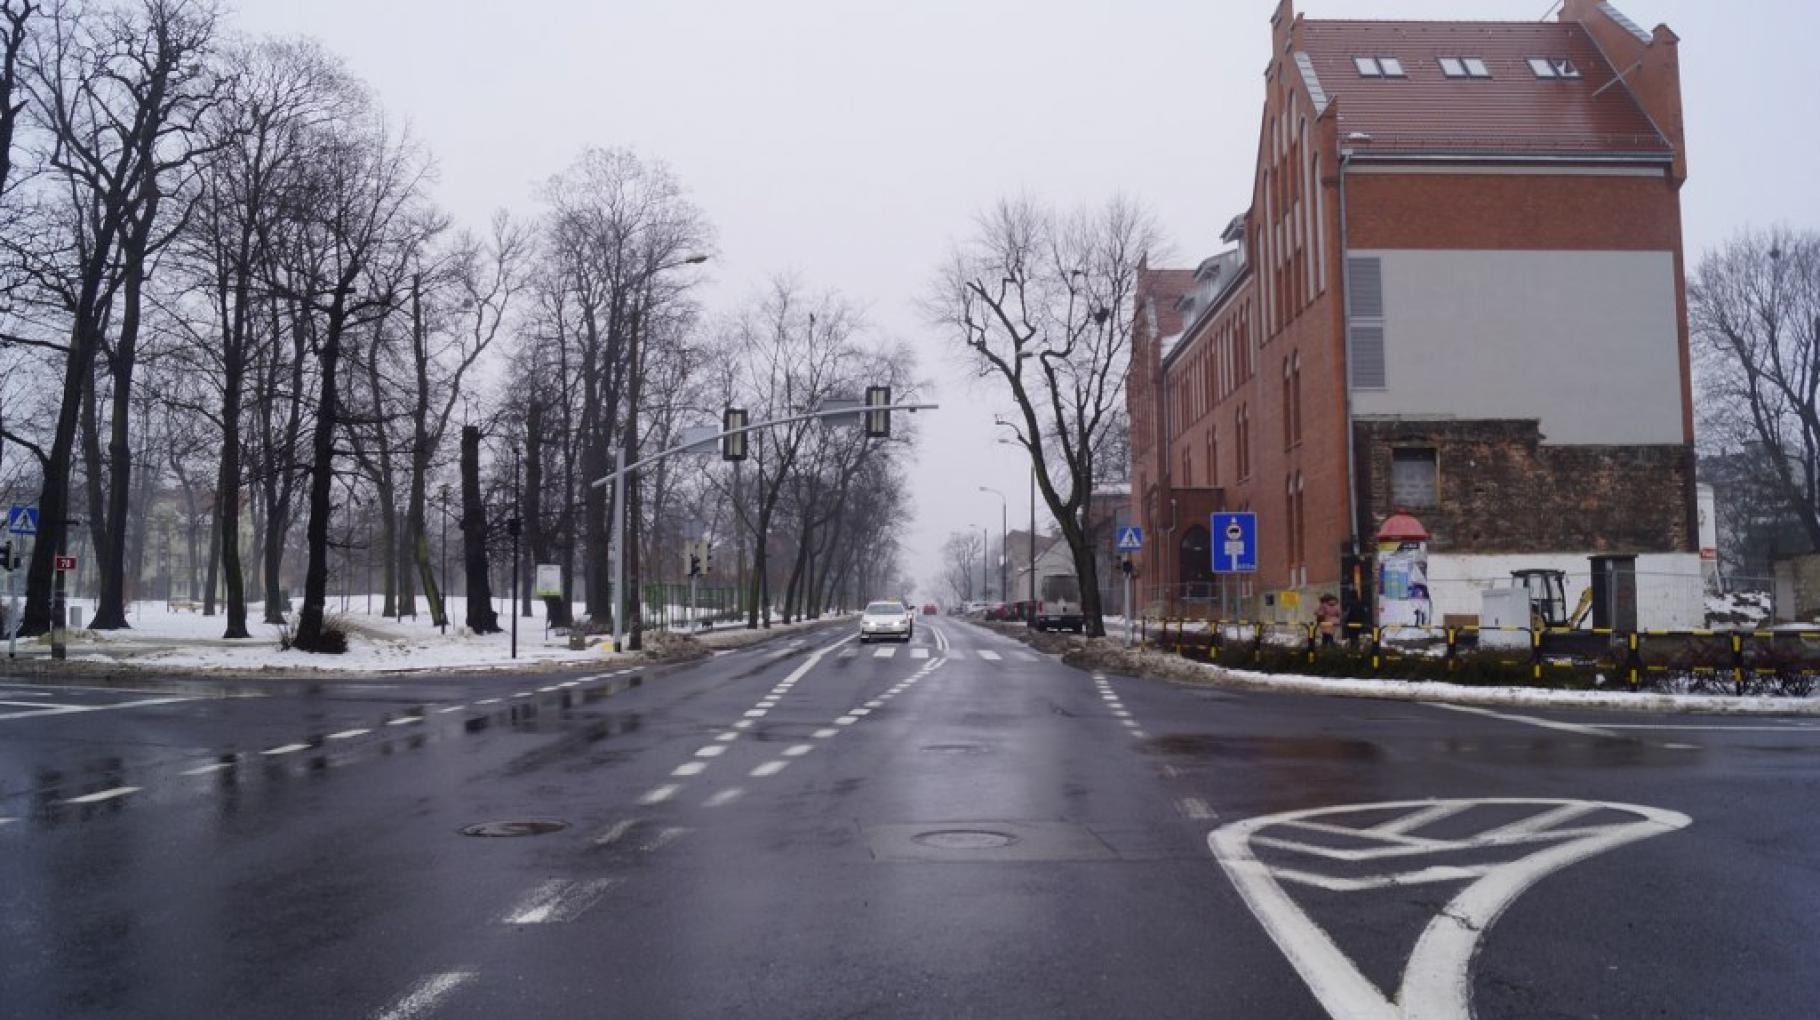 ul. Toszecka